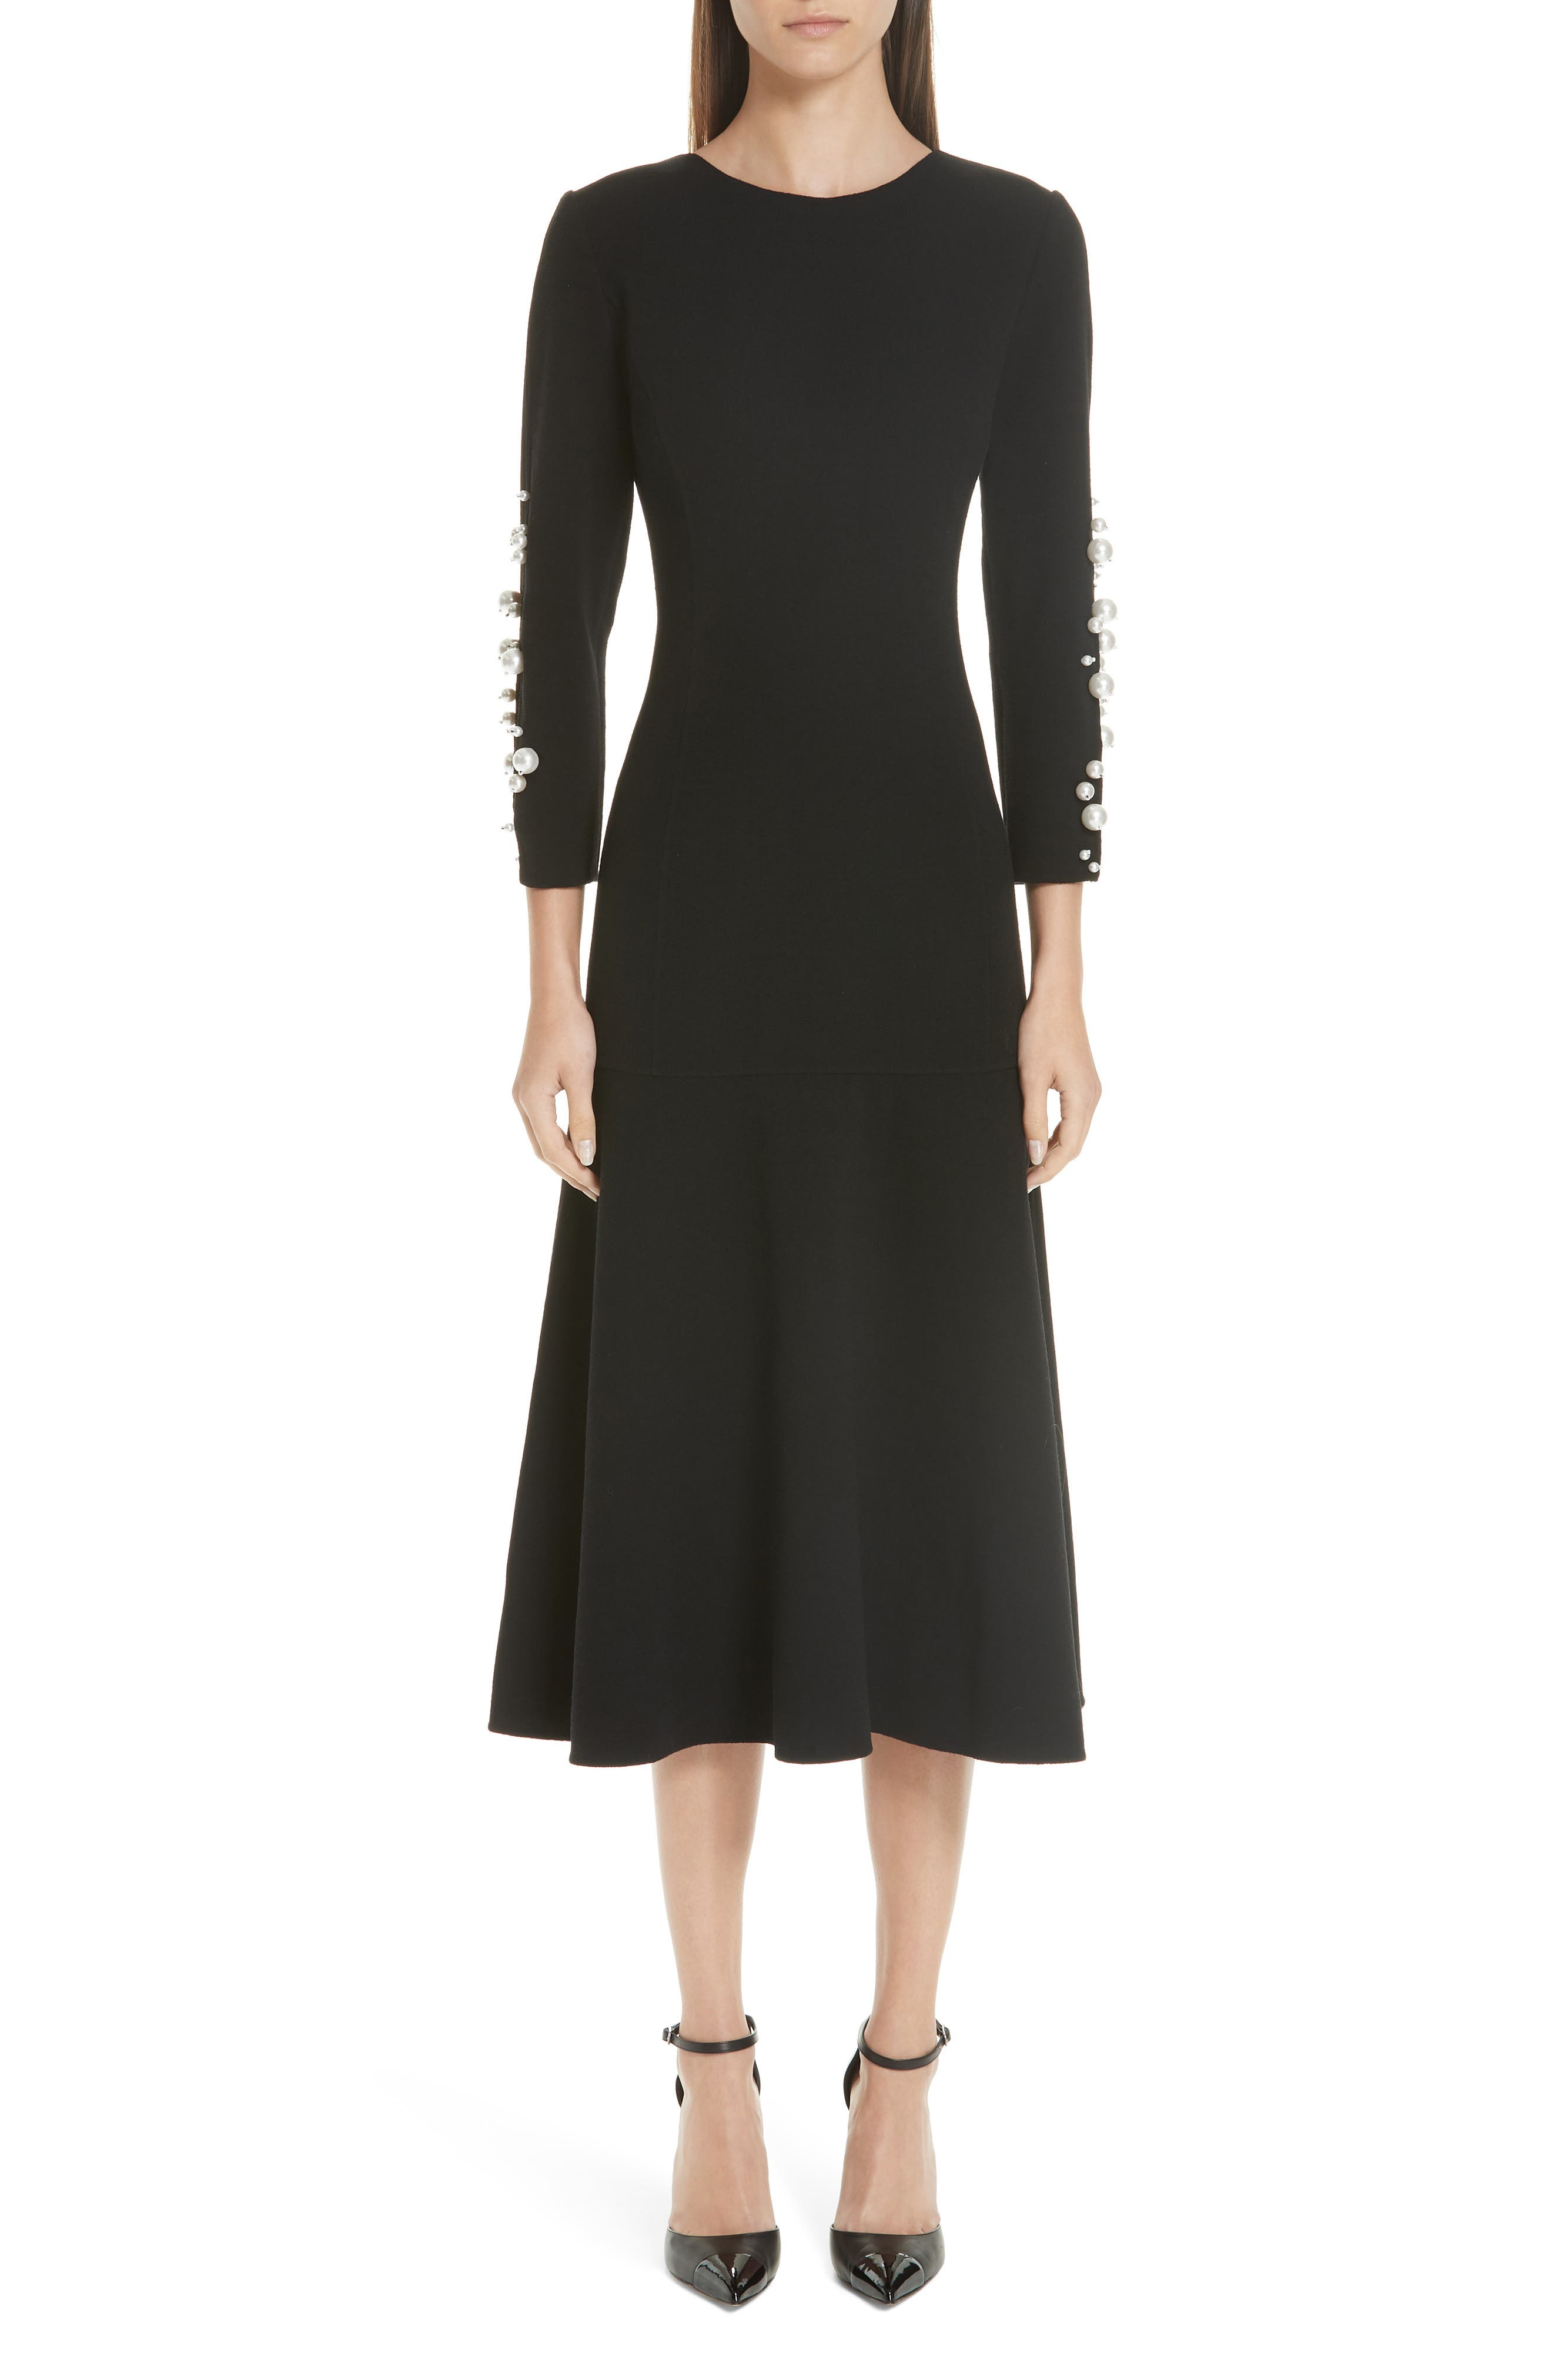 Dress for Women, Evening Cocktail Party On Sale, Grey, Wool, 2017, 10 8 Comme Des Garçons